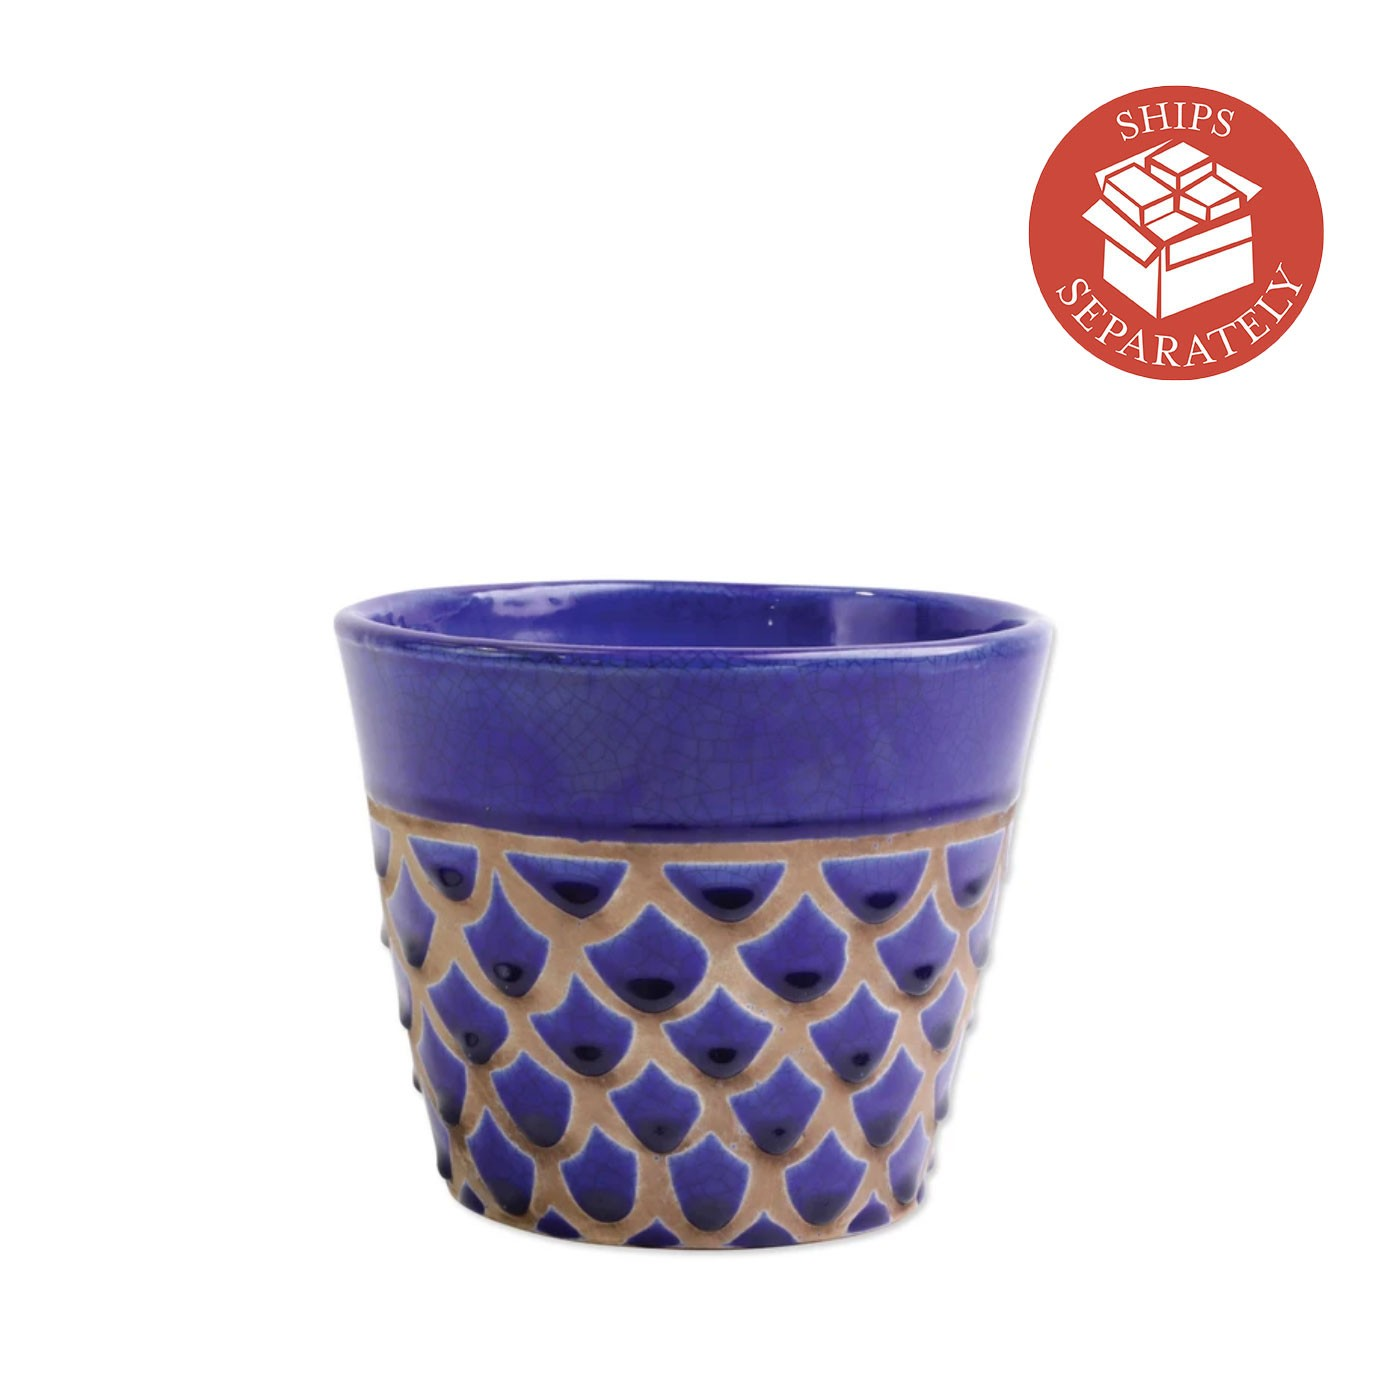 Garden Geo Cobalt Medium Cachepot - Vietri | Eataly.com